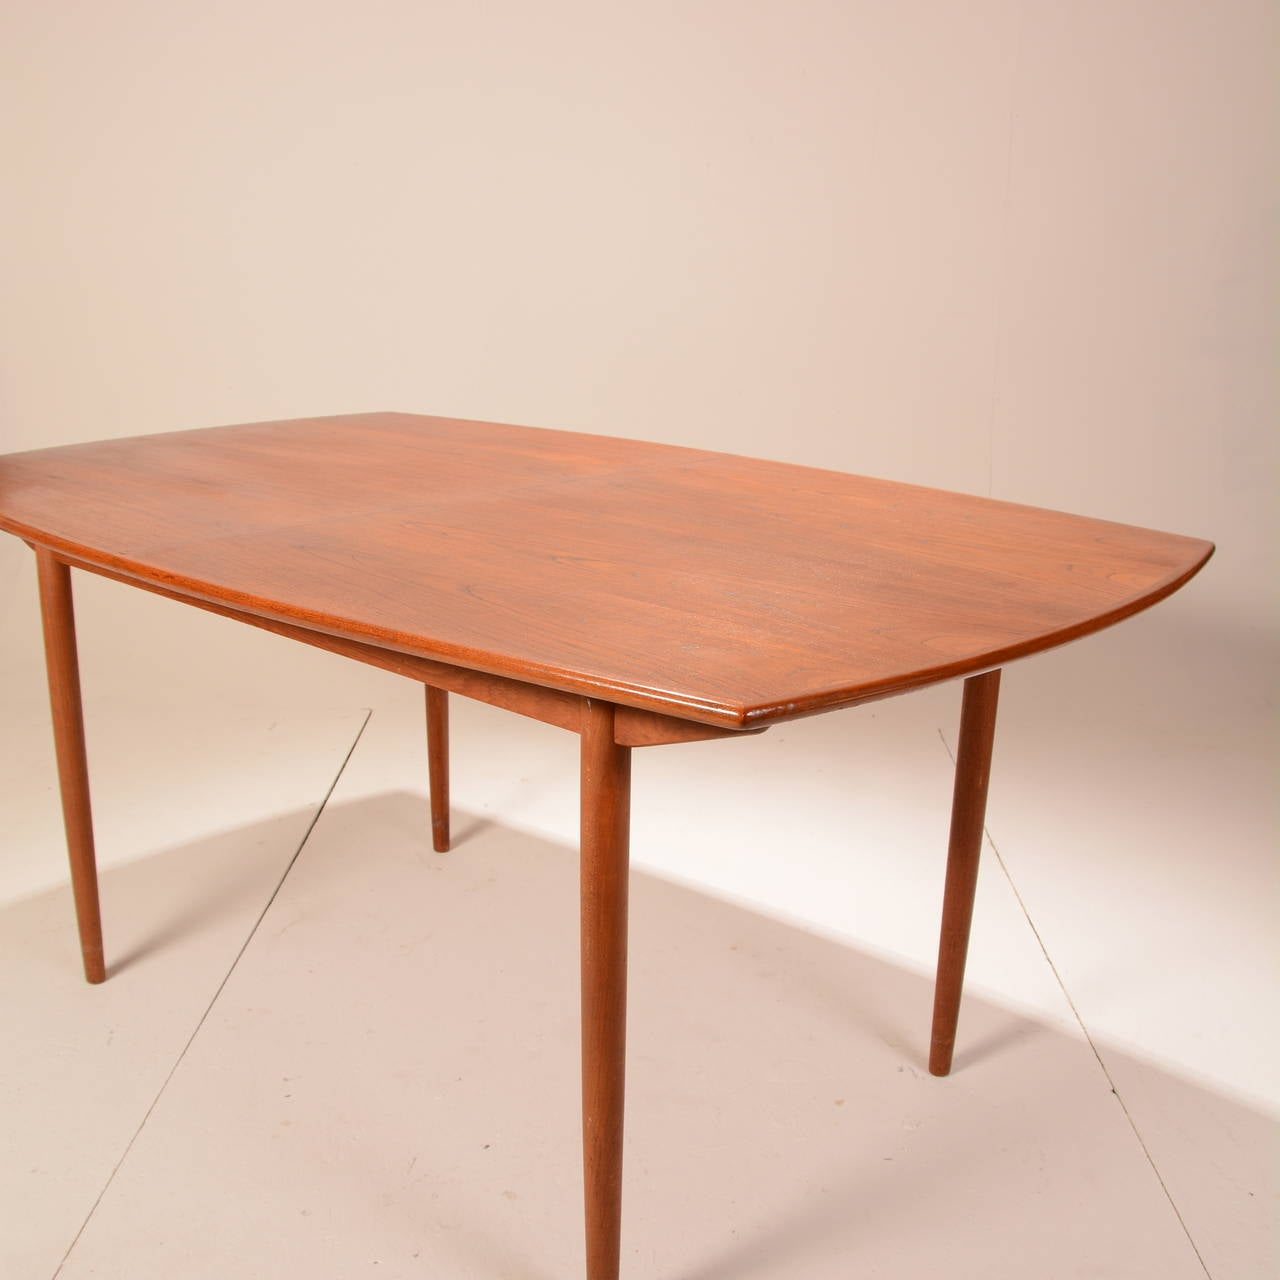 Mid Century Dining Table: Mid-Century Modern Teak Extending Dining Table At 1stdibs